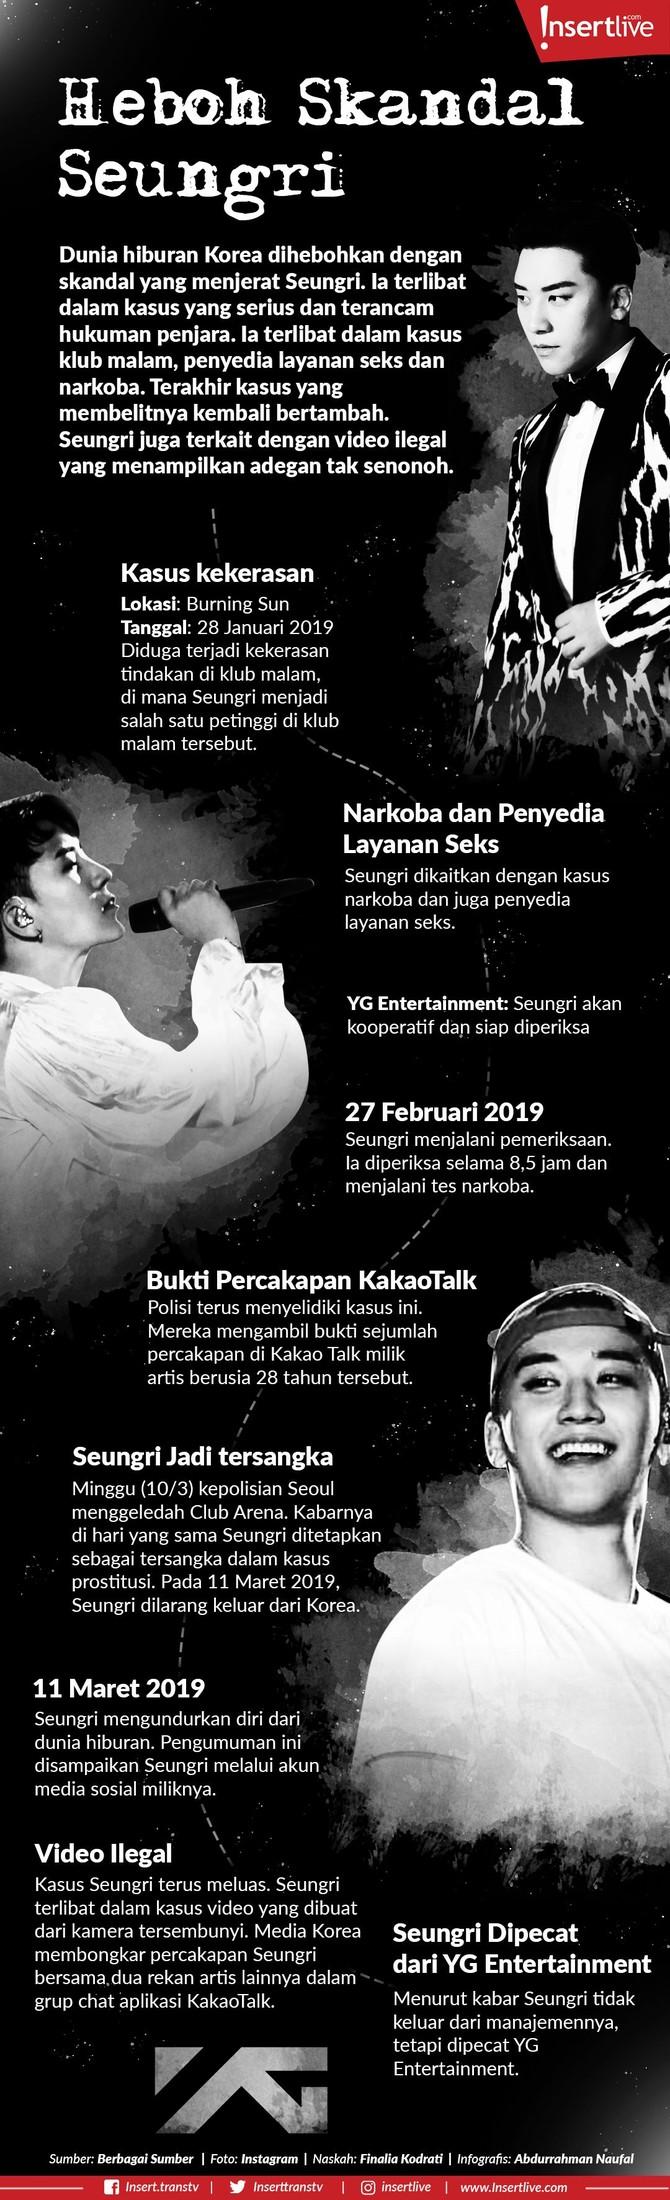 Infografis: Heboh Skandal Seungri